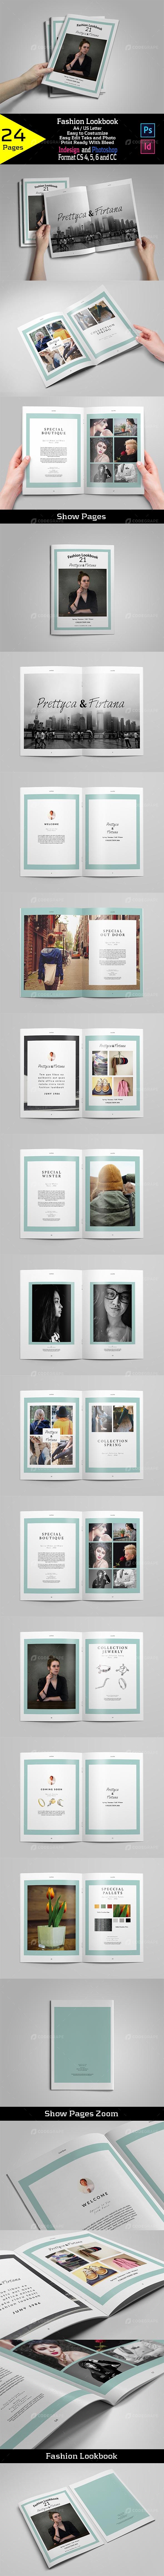 Fashion Look Book